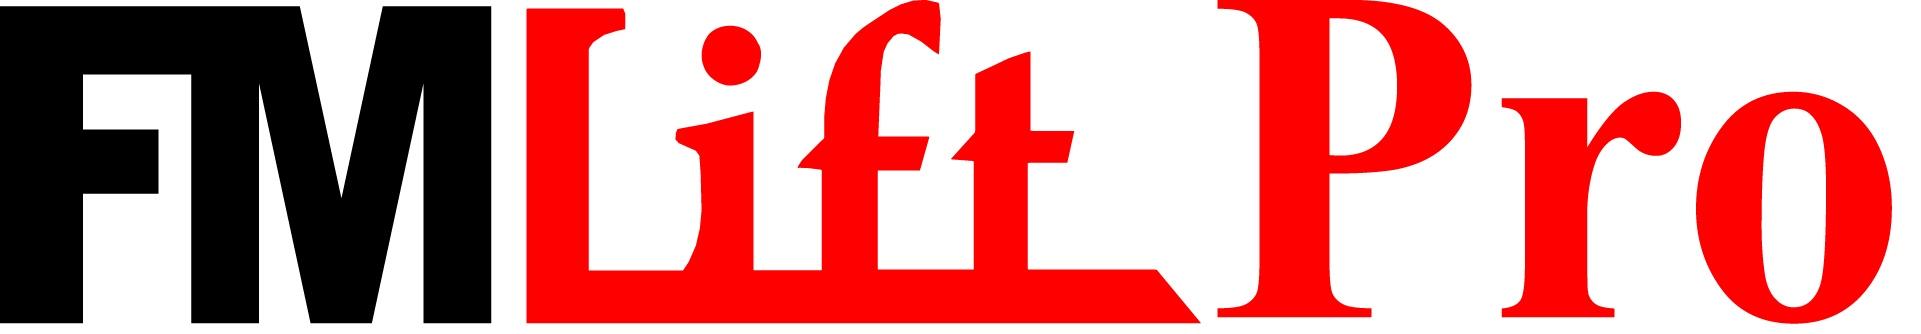 F-M Forklift Sales & Service, Inc.